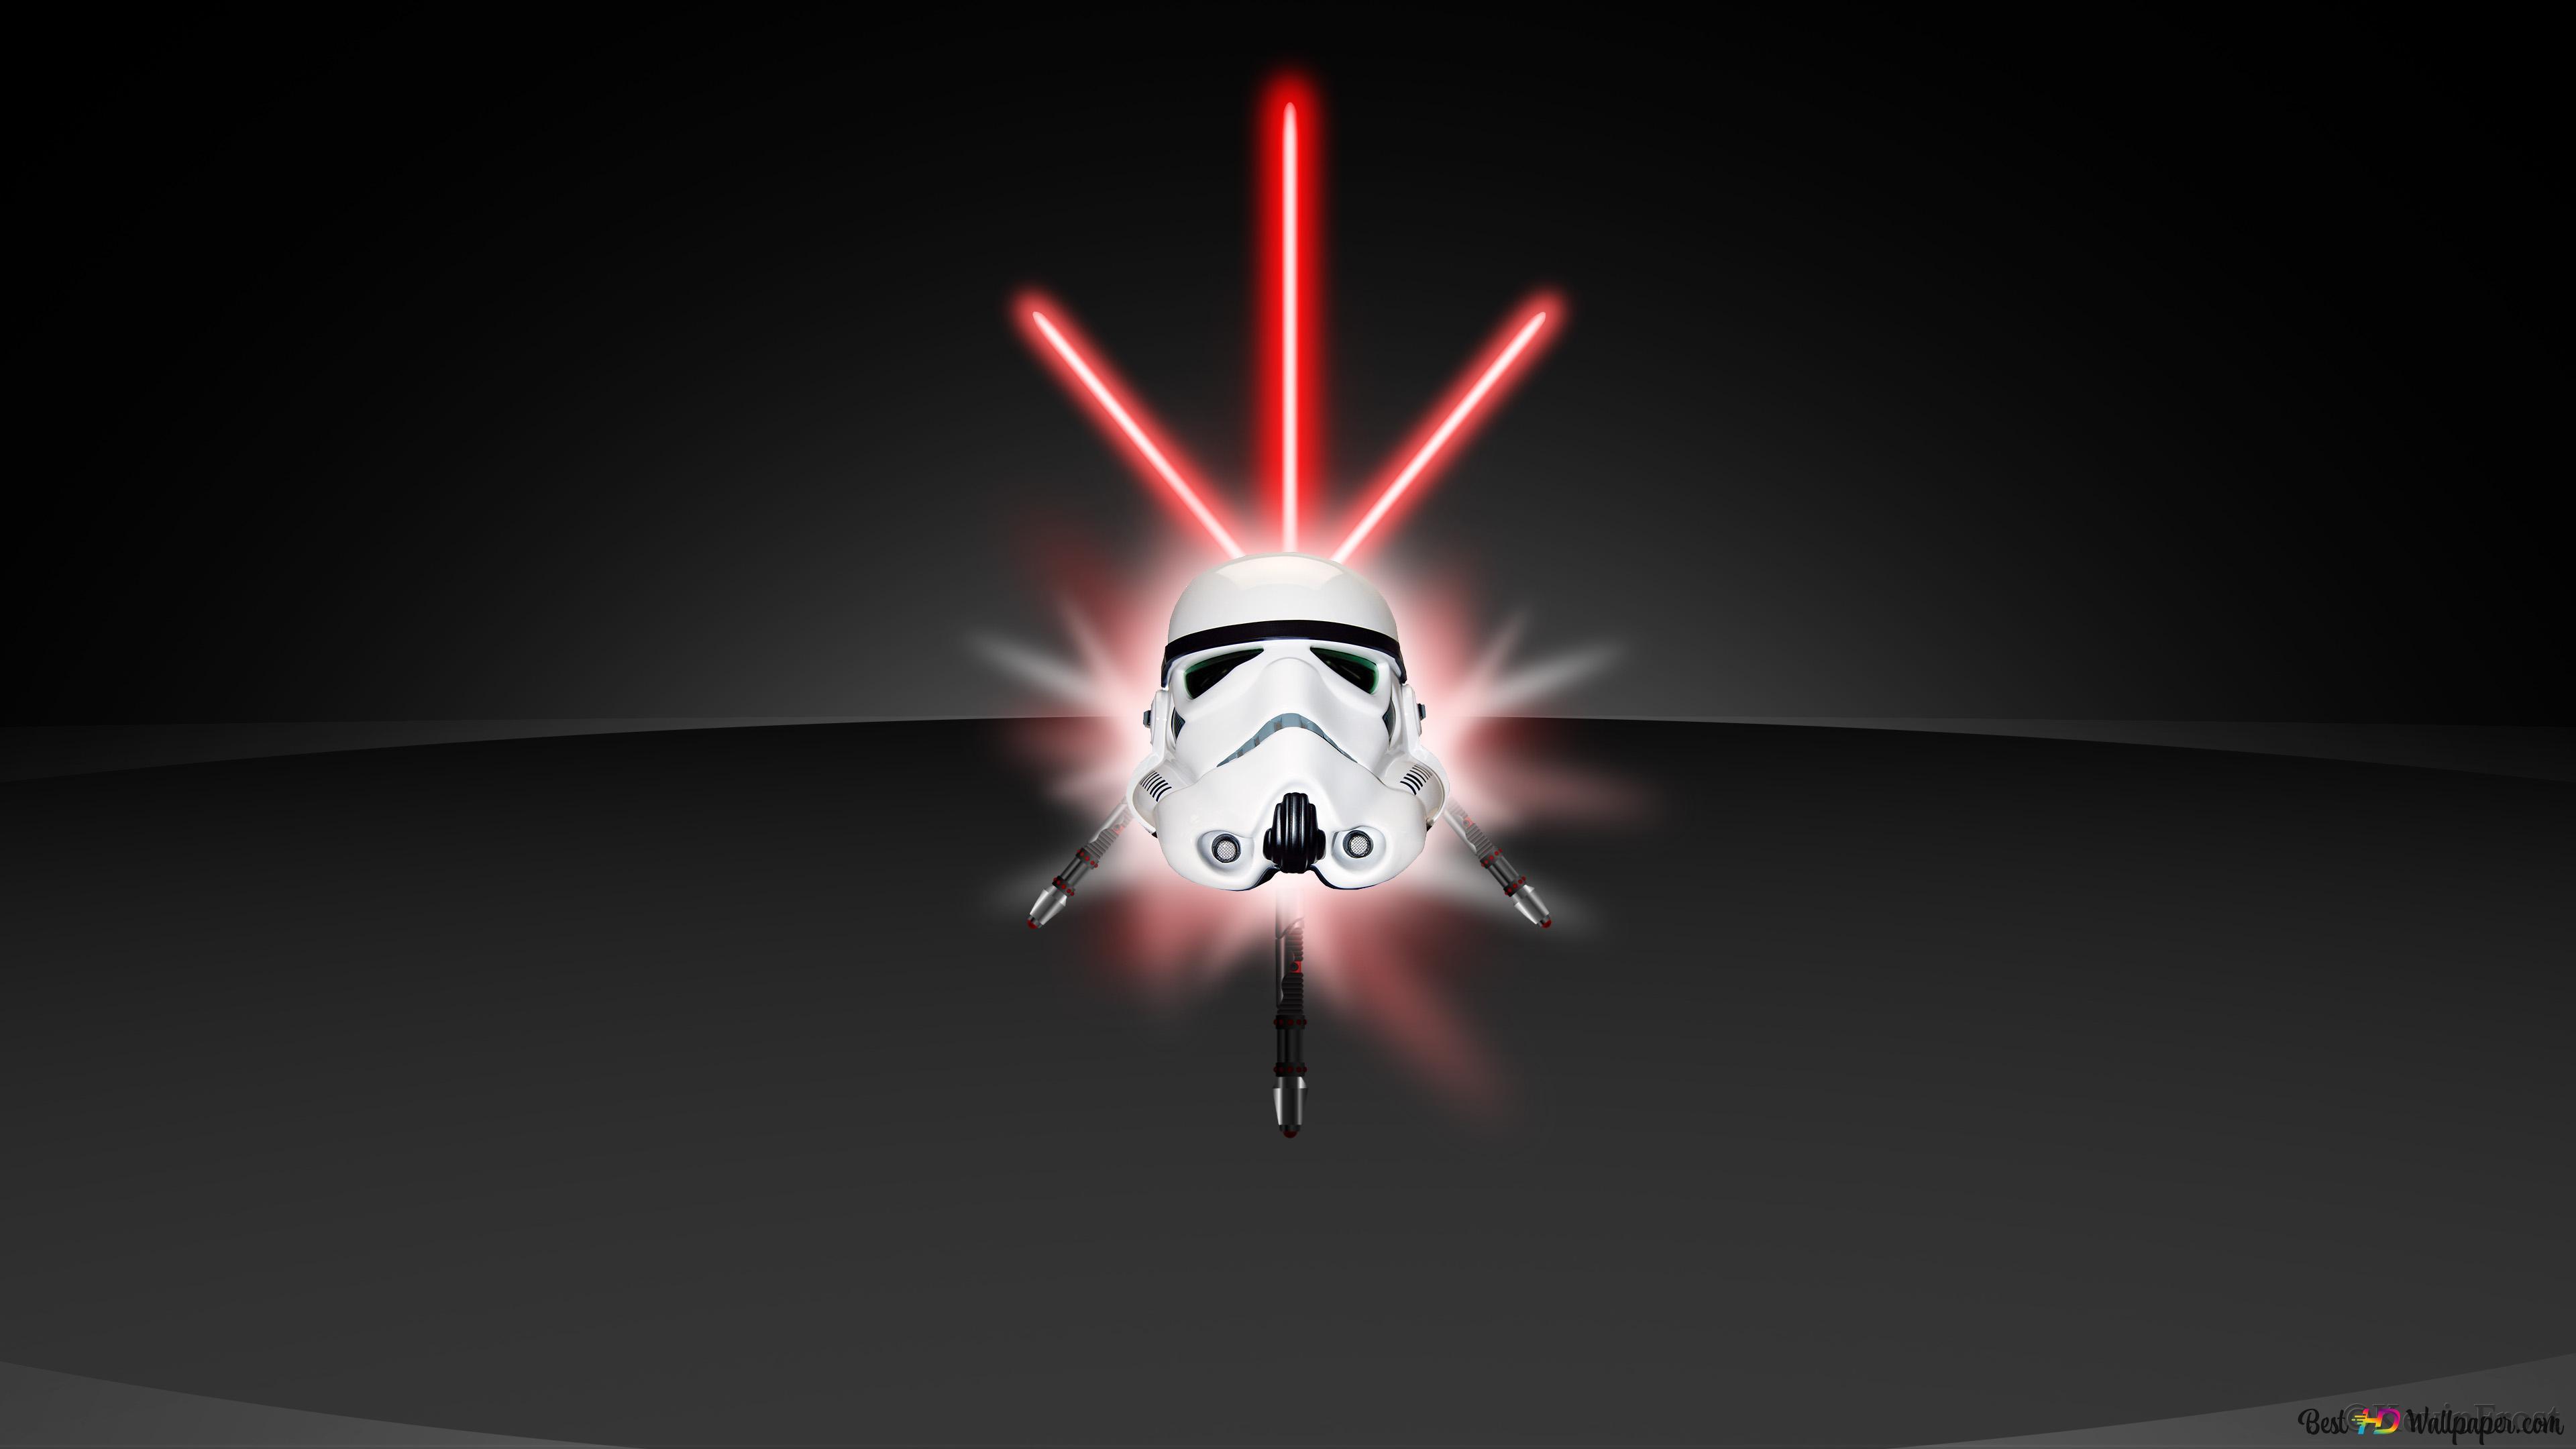 Clone trooper & lightsaber HD wallpaper